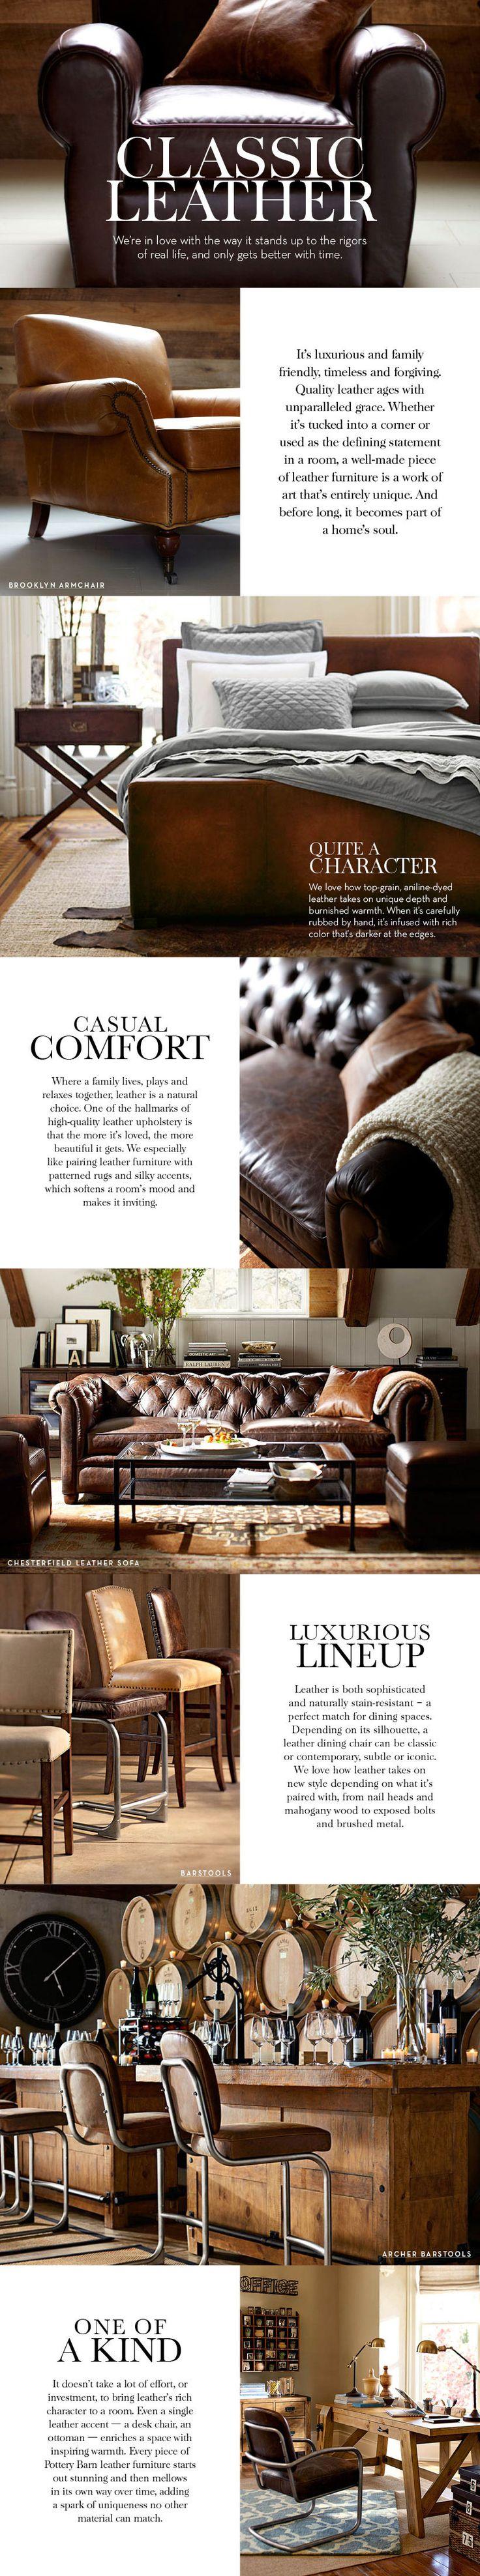 Best 20 Chesterfield leather sofa ideas on Pinterest